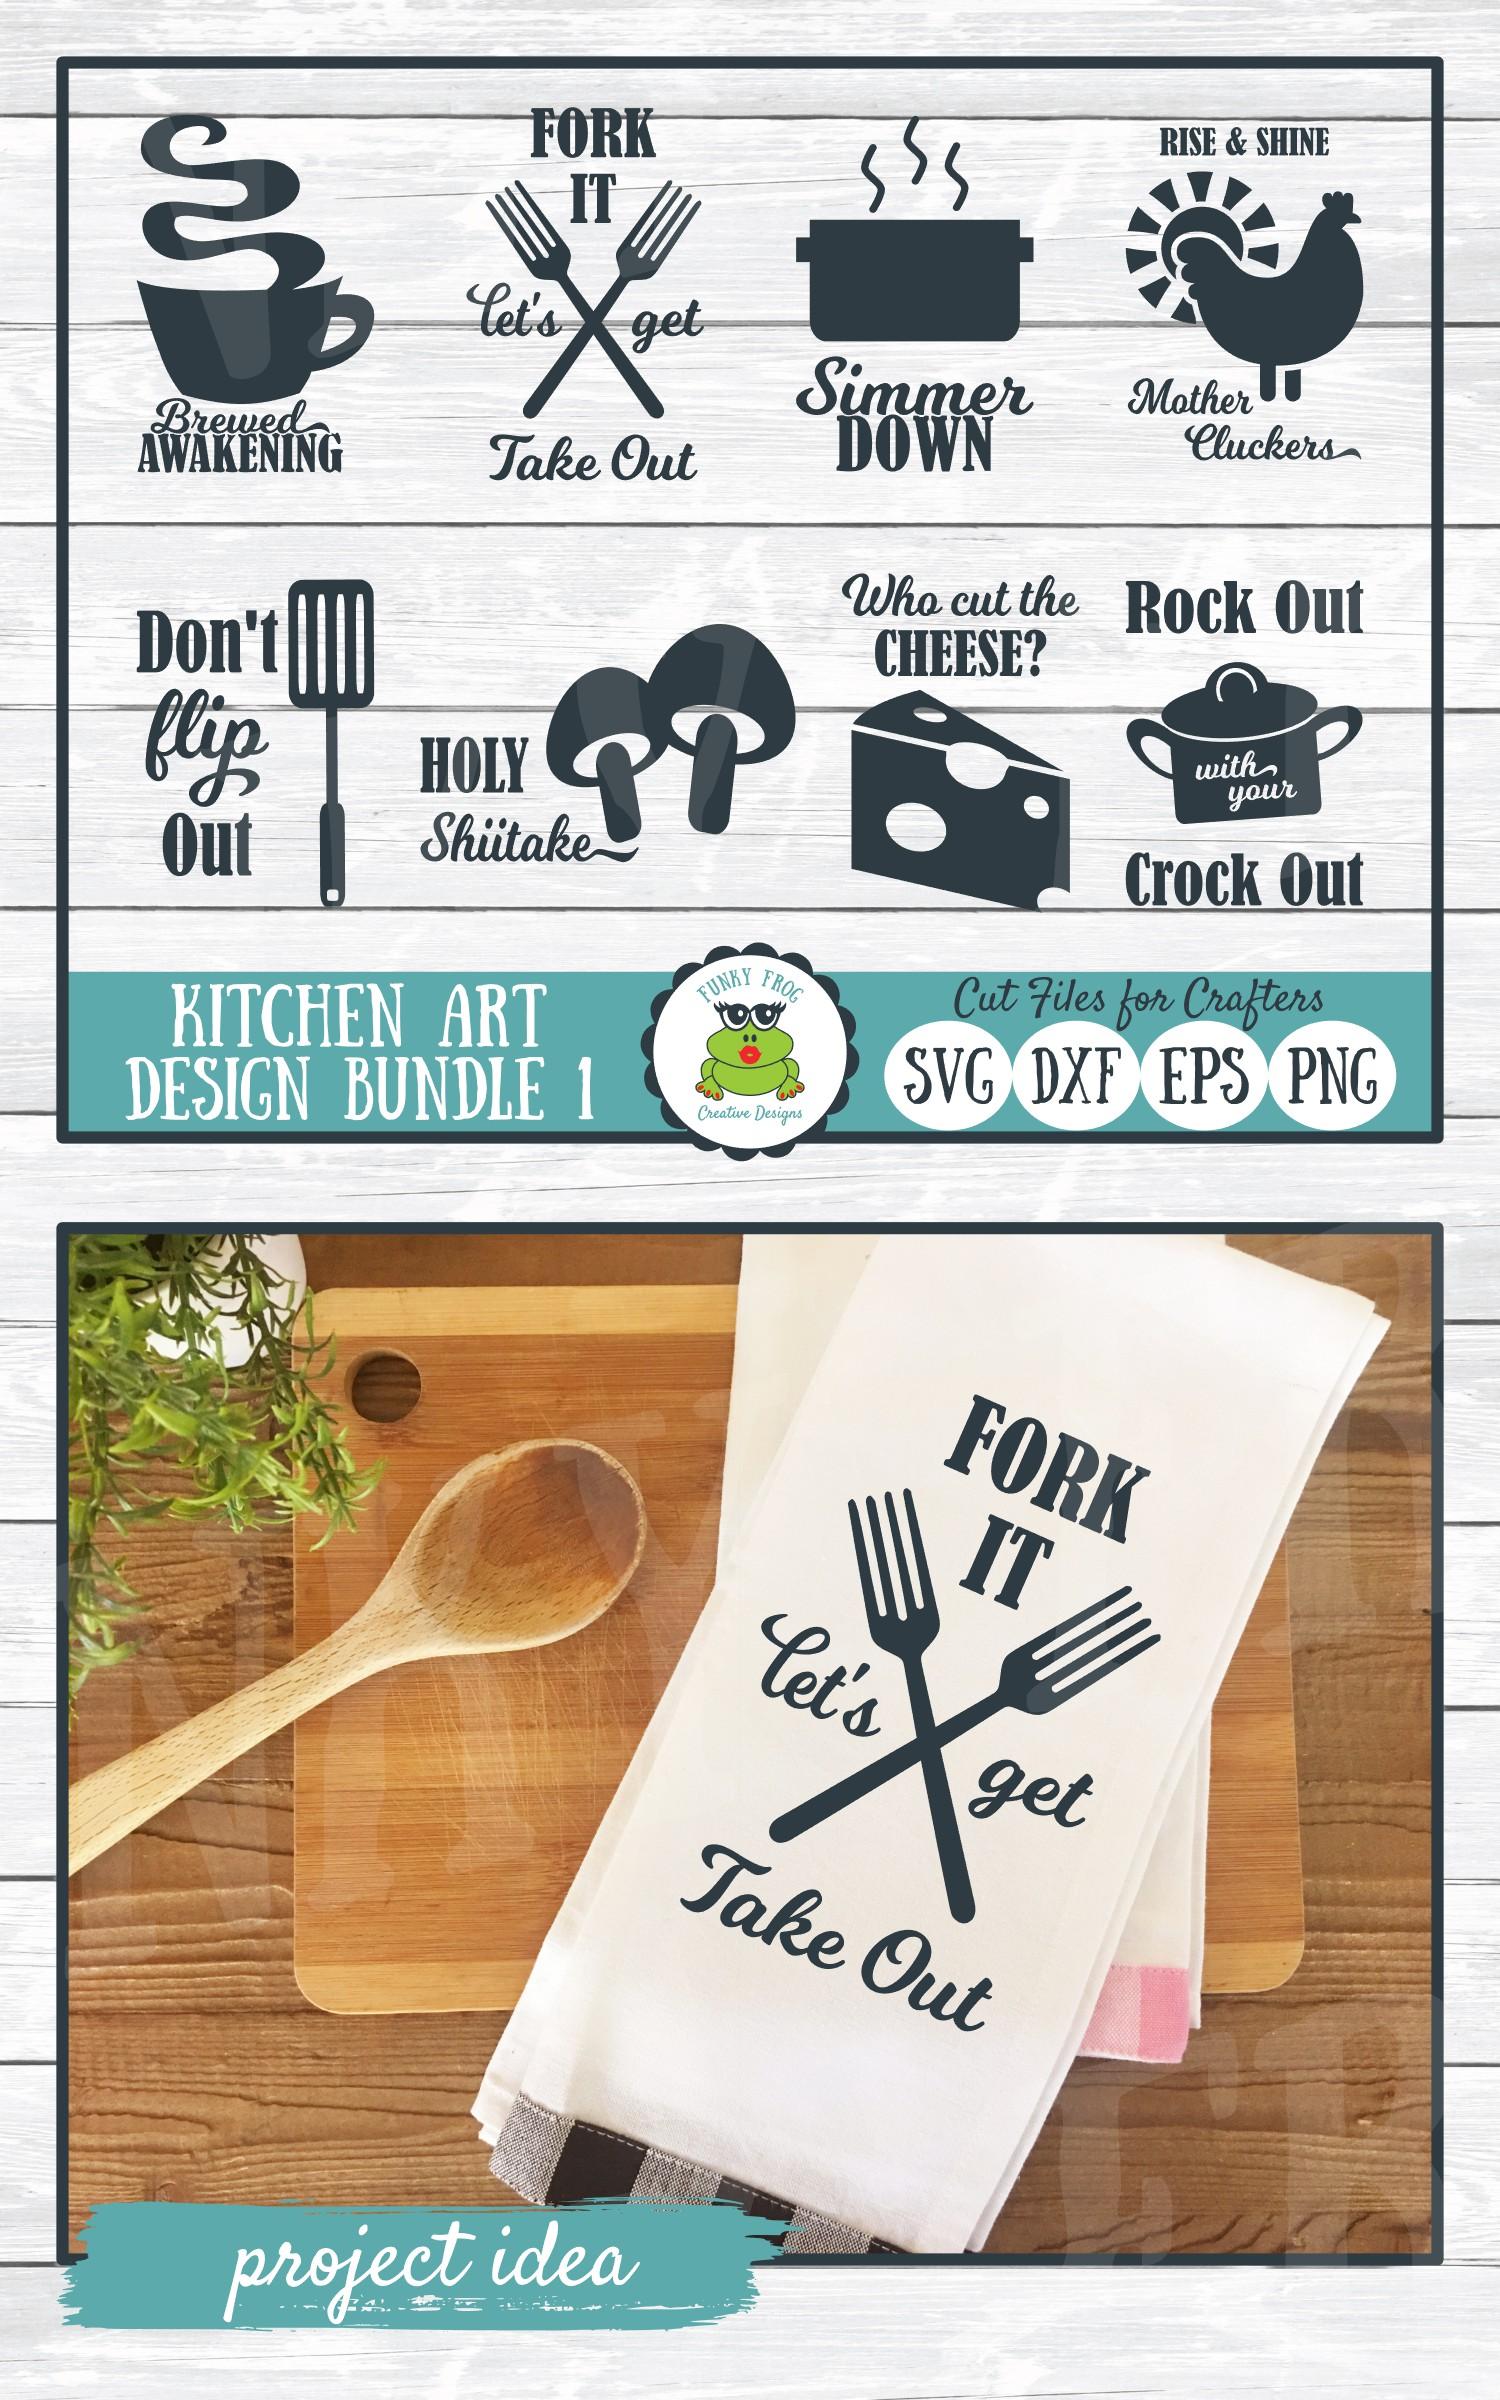 Kitchen Art Design Bundle 1- SVG Cut Files for Crafter example image 6